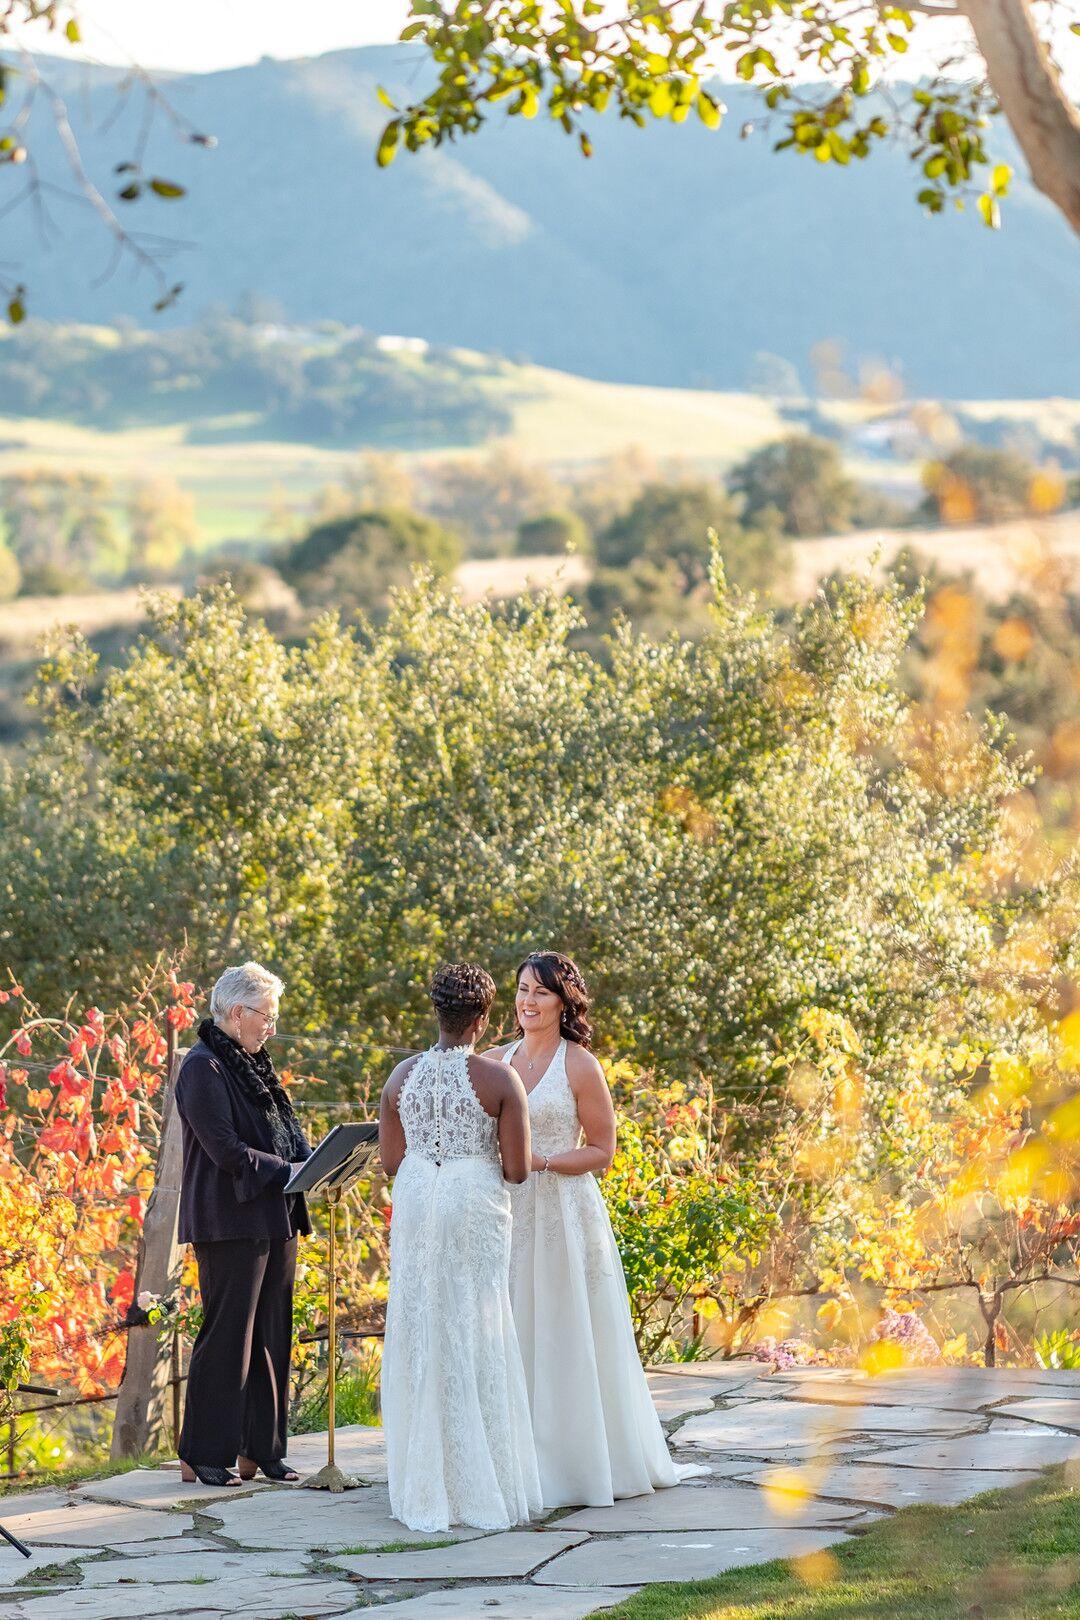 www.santabarbarawedding.com | Venue: The Casitas of Arroyo Grande | Photographer: Renoda Campbell Photography | Second Shooter: John Patrick Images |  Ceremony Wedding Vows